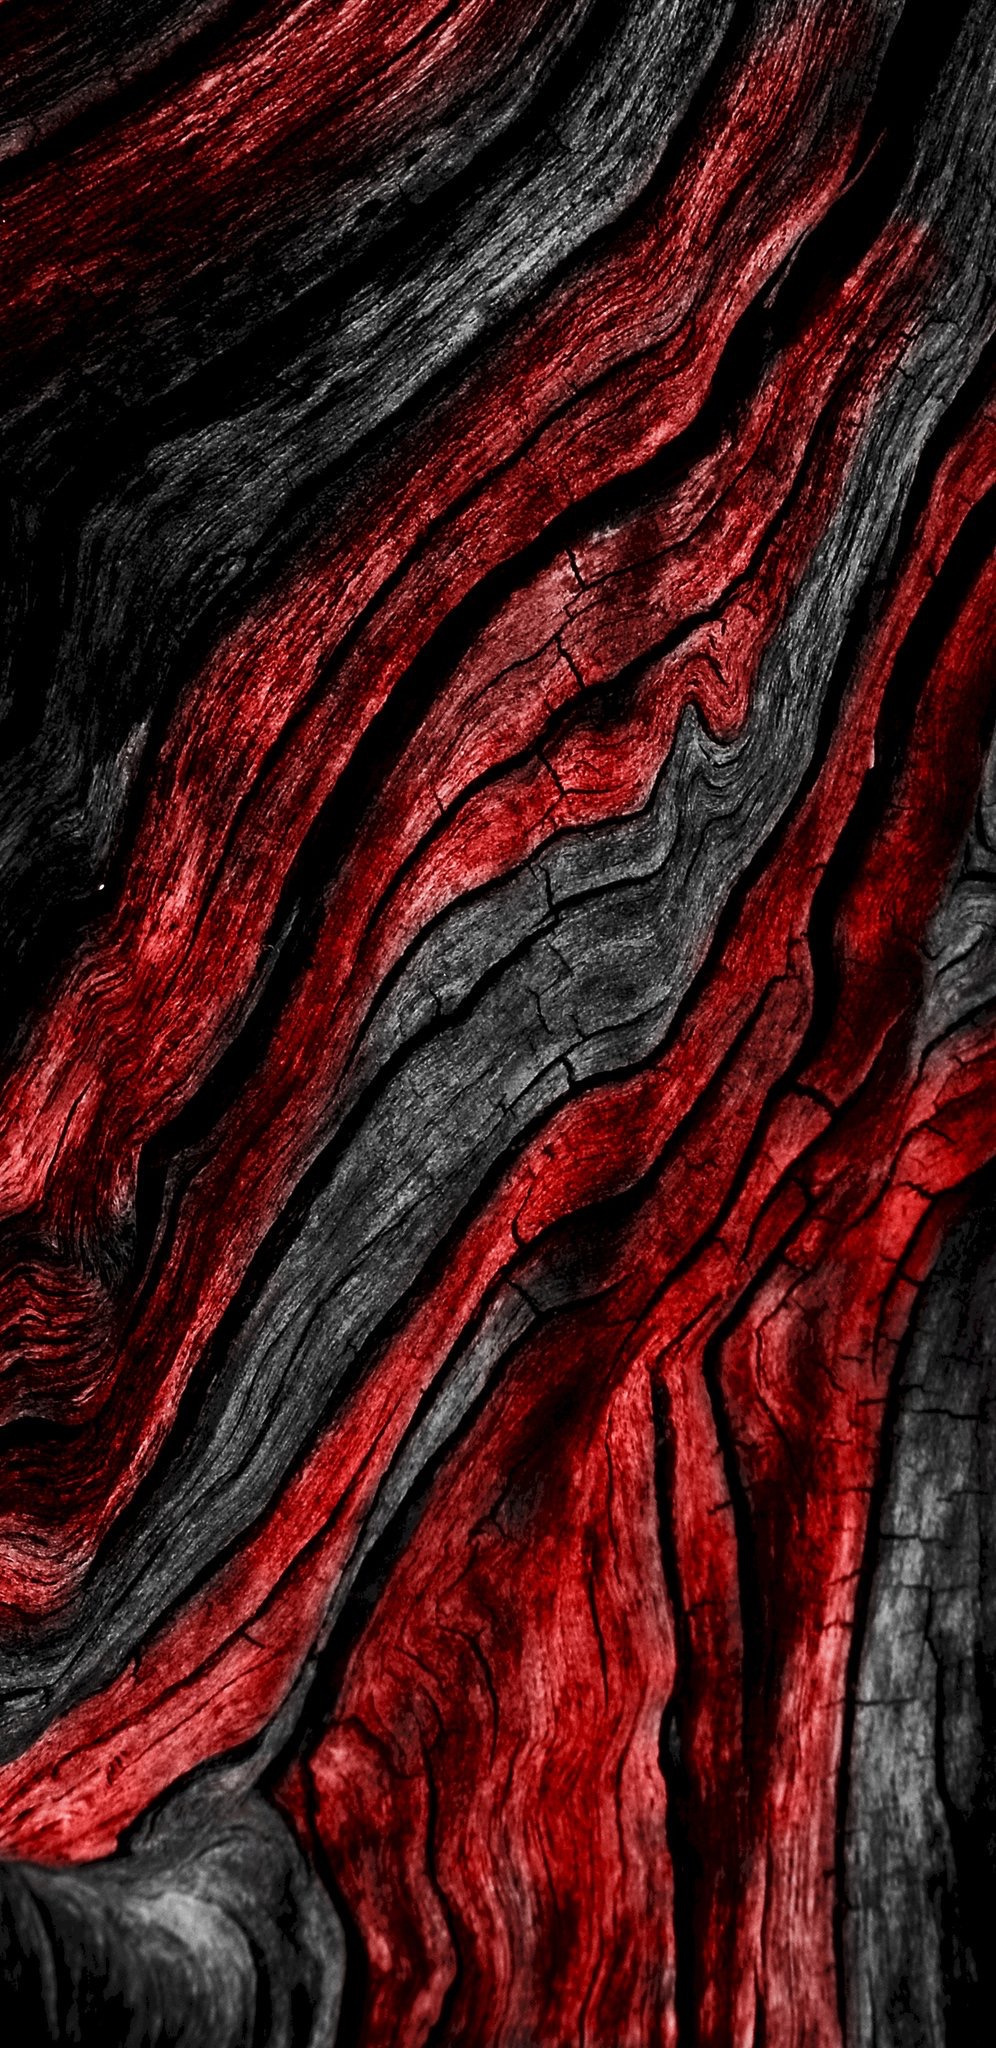 تصویر زمینه قرمز